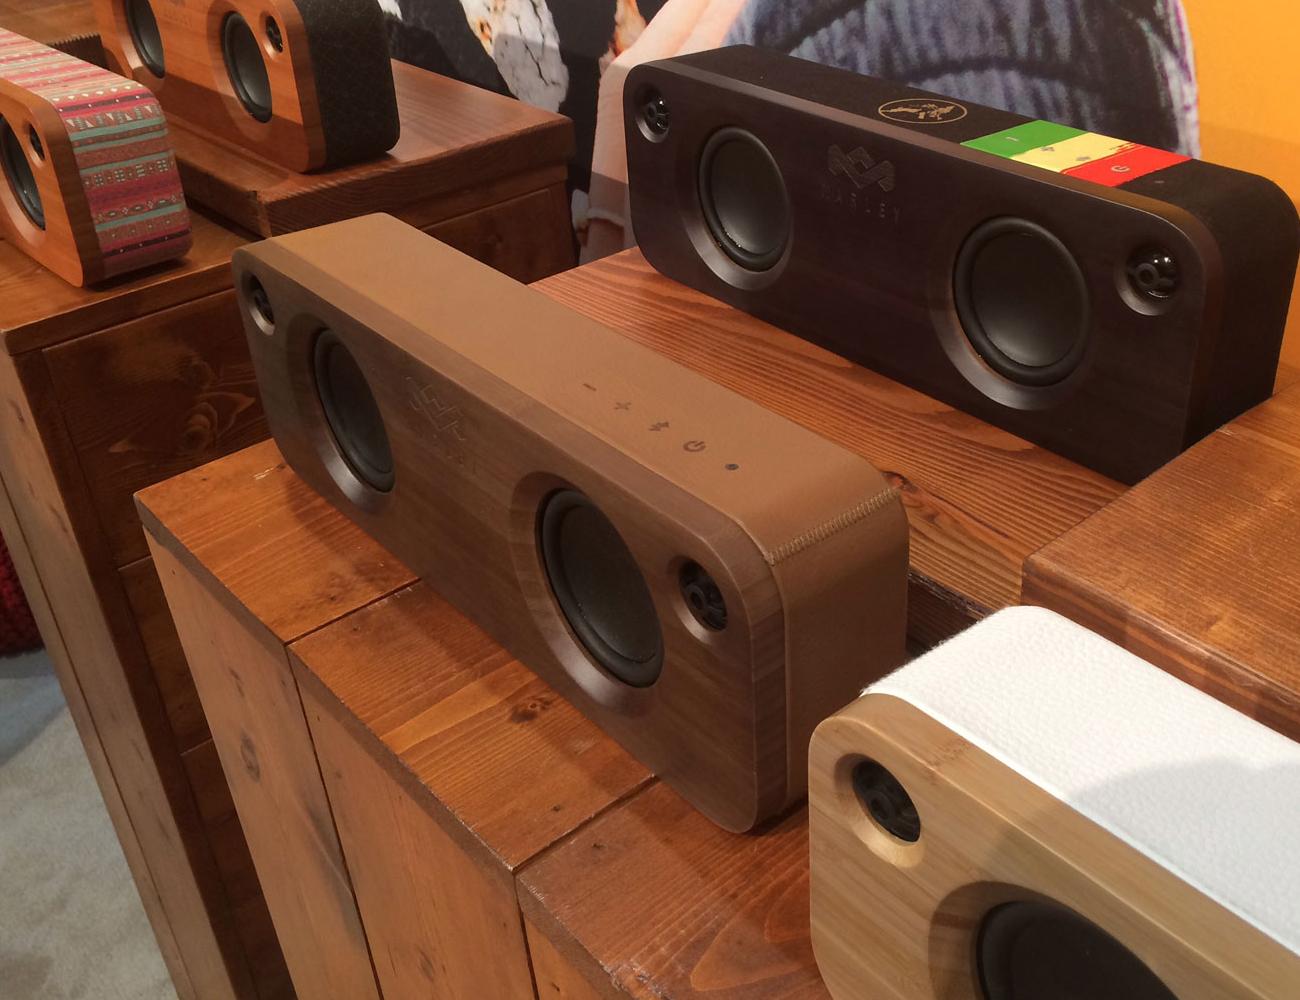 House of Marley Portable Speaker Bundle